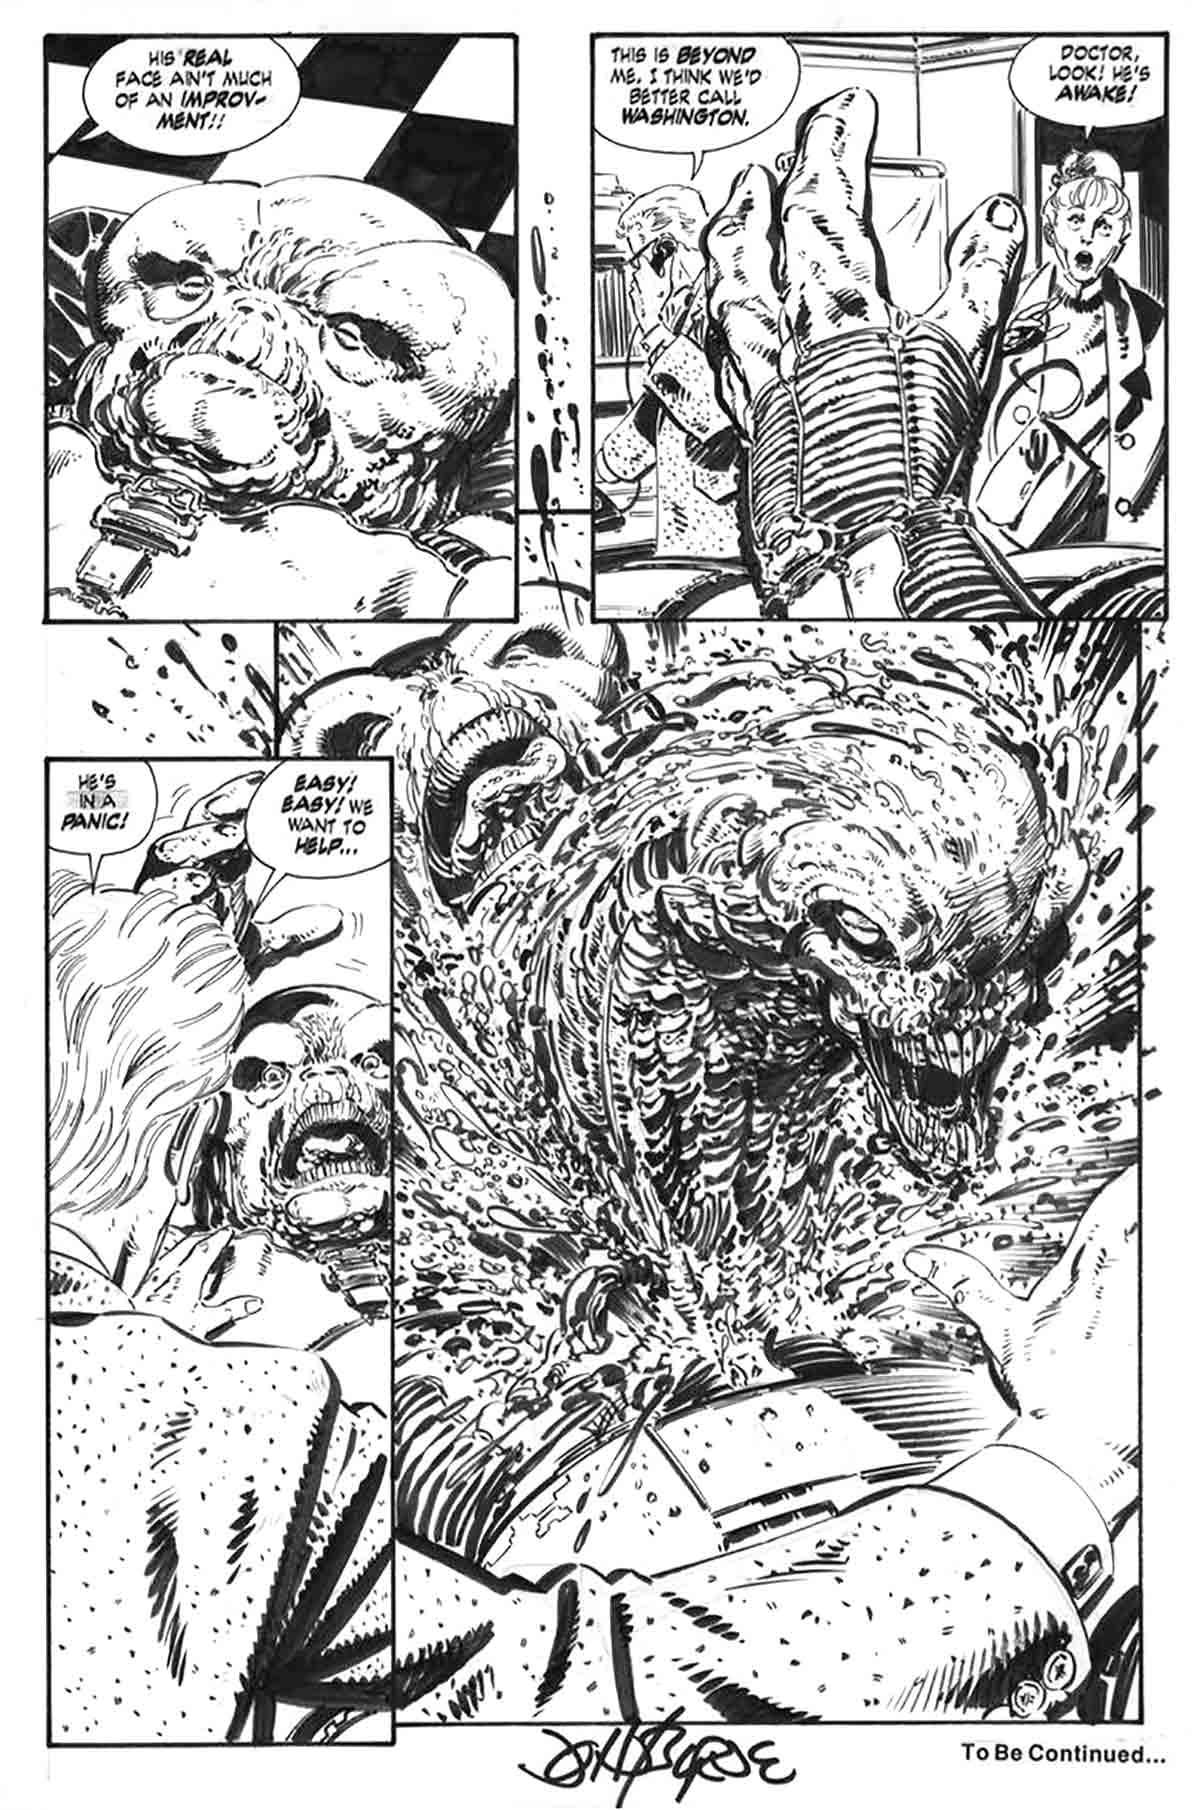 Dibujo original de John Byrne. Aliens: Earth Angel, Pág. 6